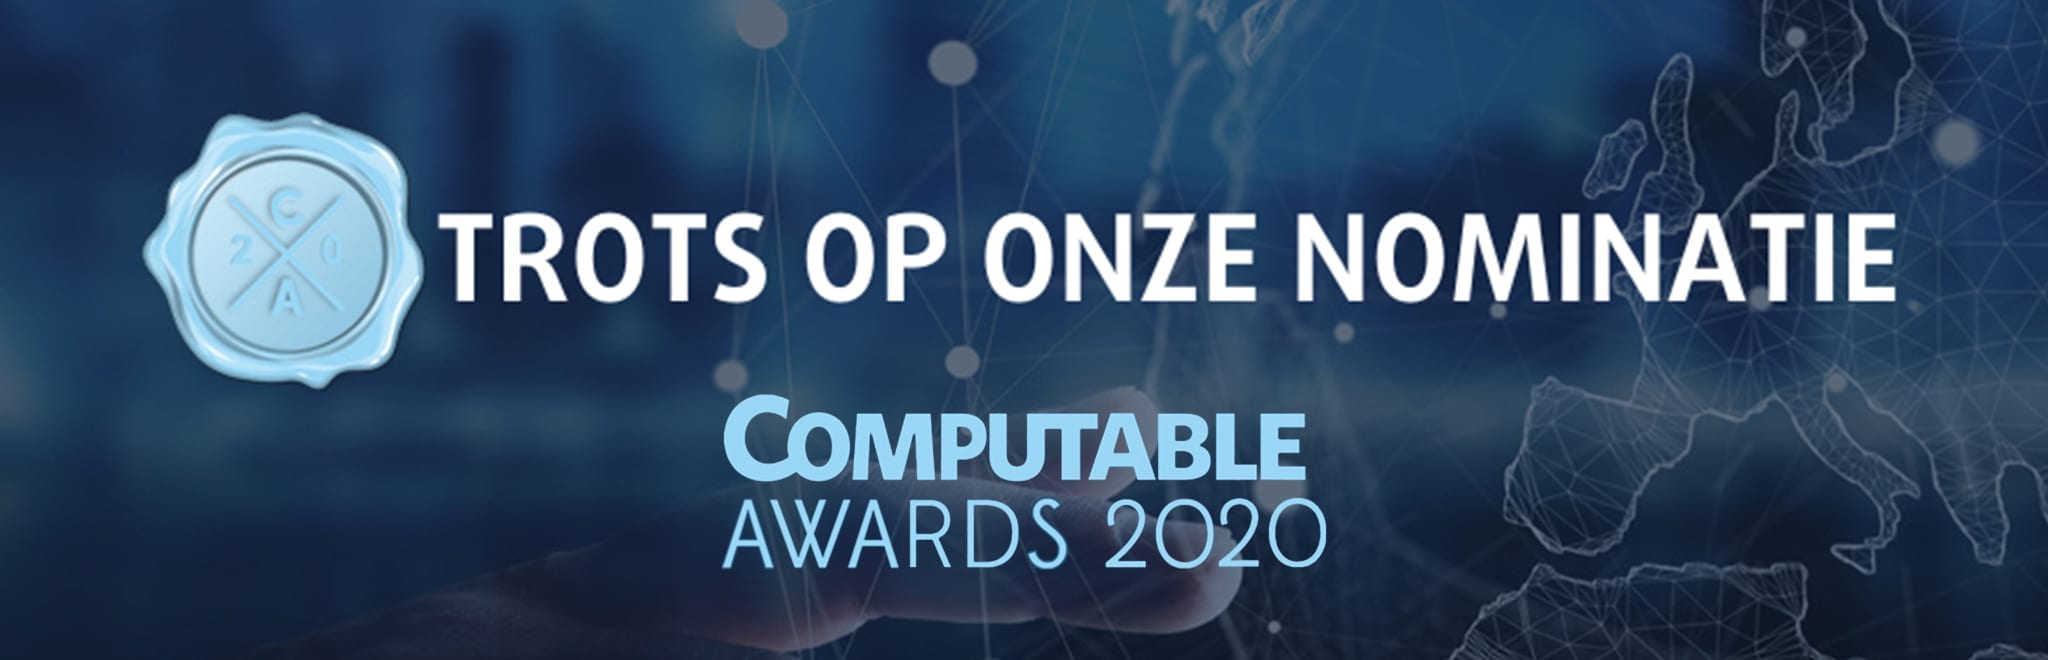 Computable Awards 2020